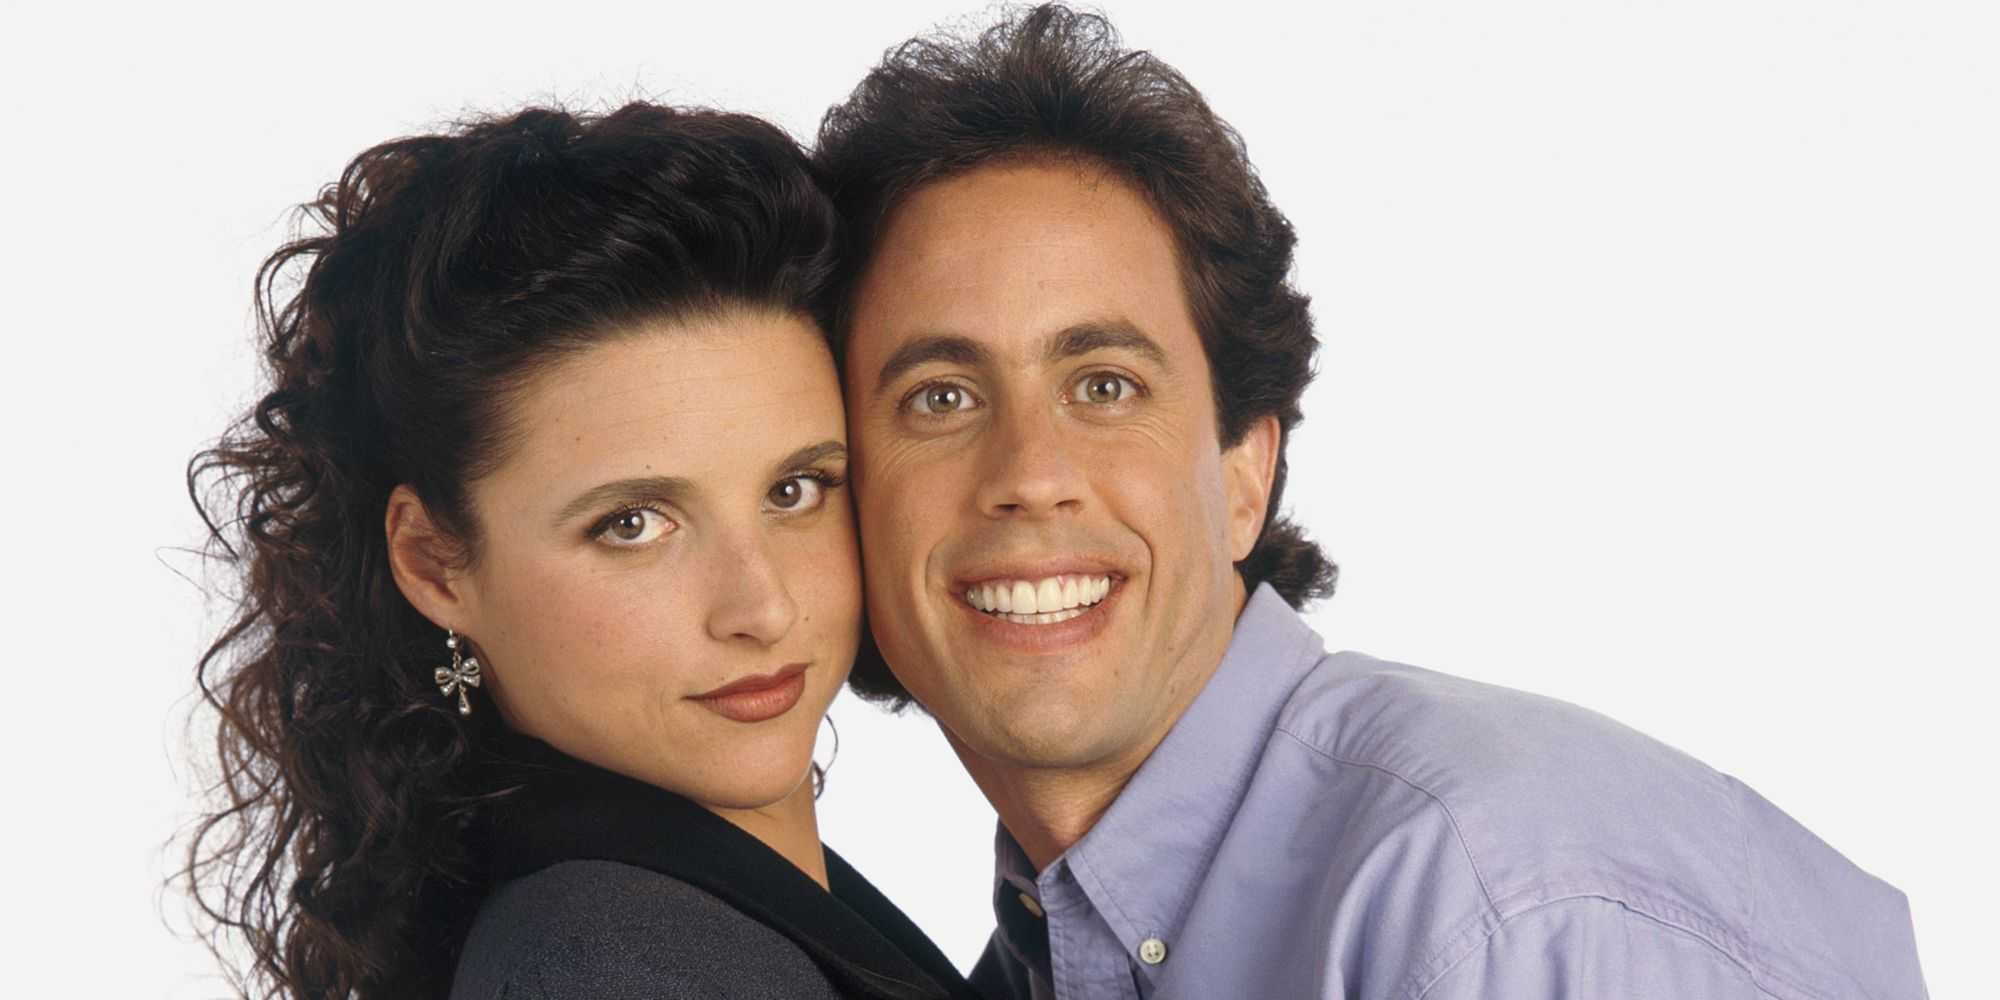 Why The Seinfeld & Elaine Romance Subplot Went Nowhere After Season 2